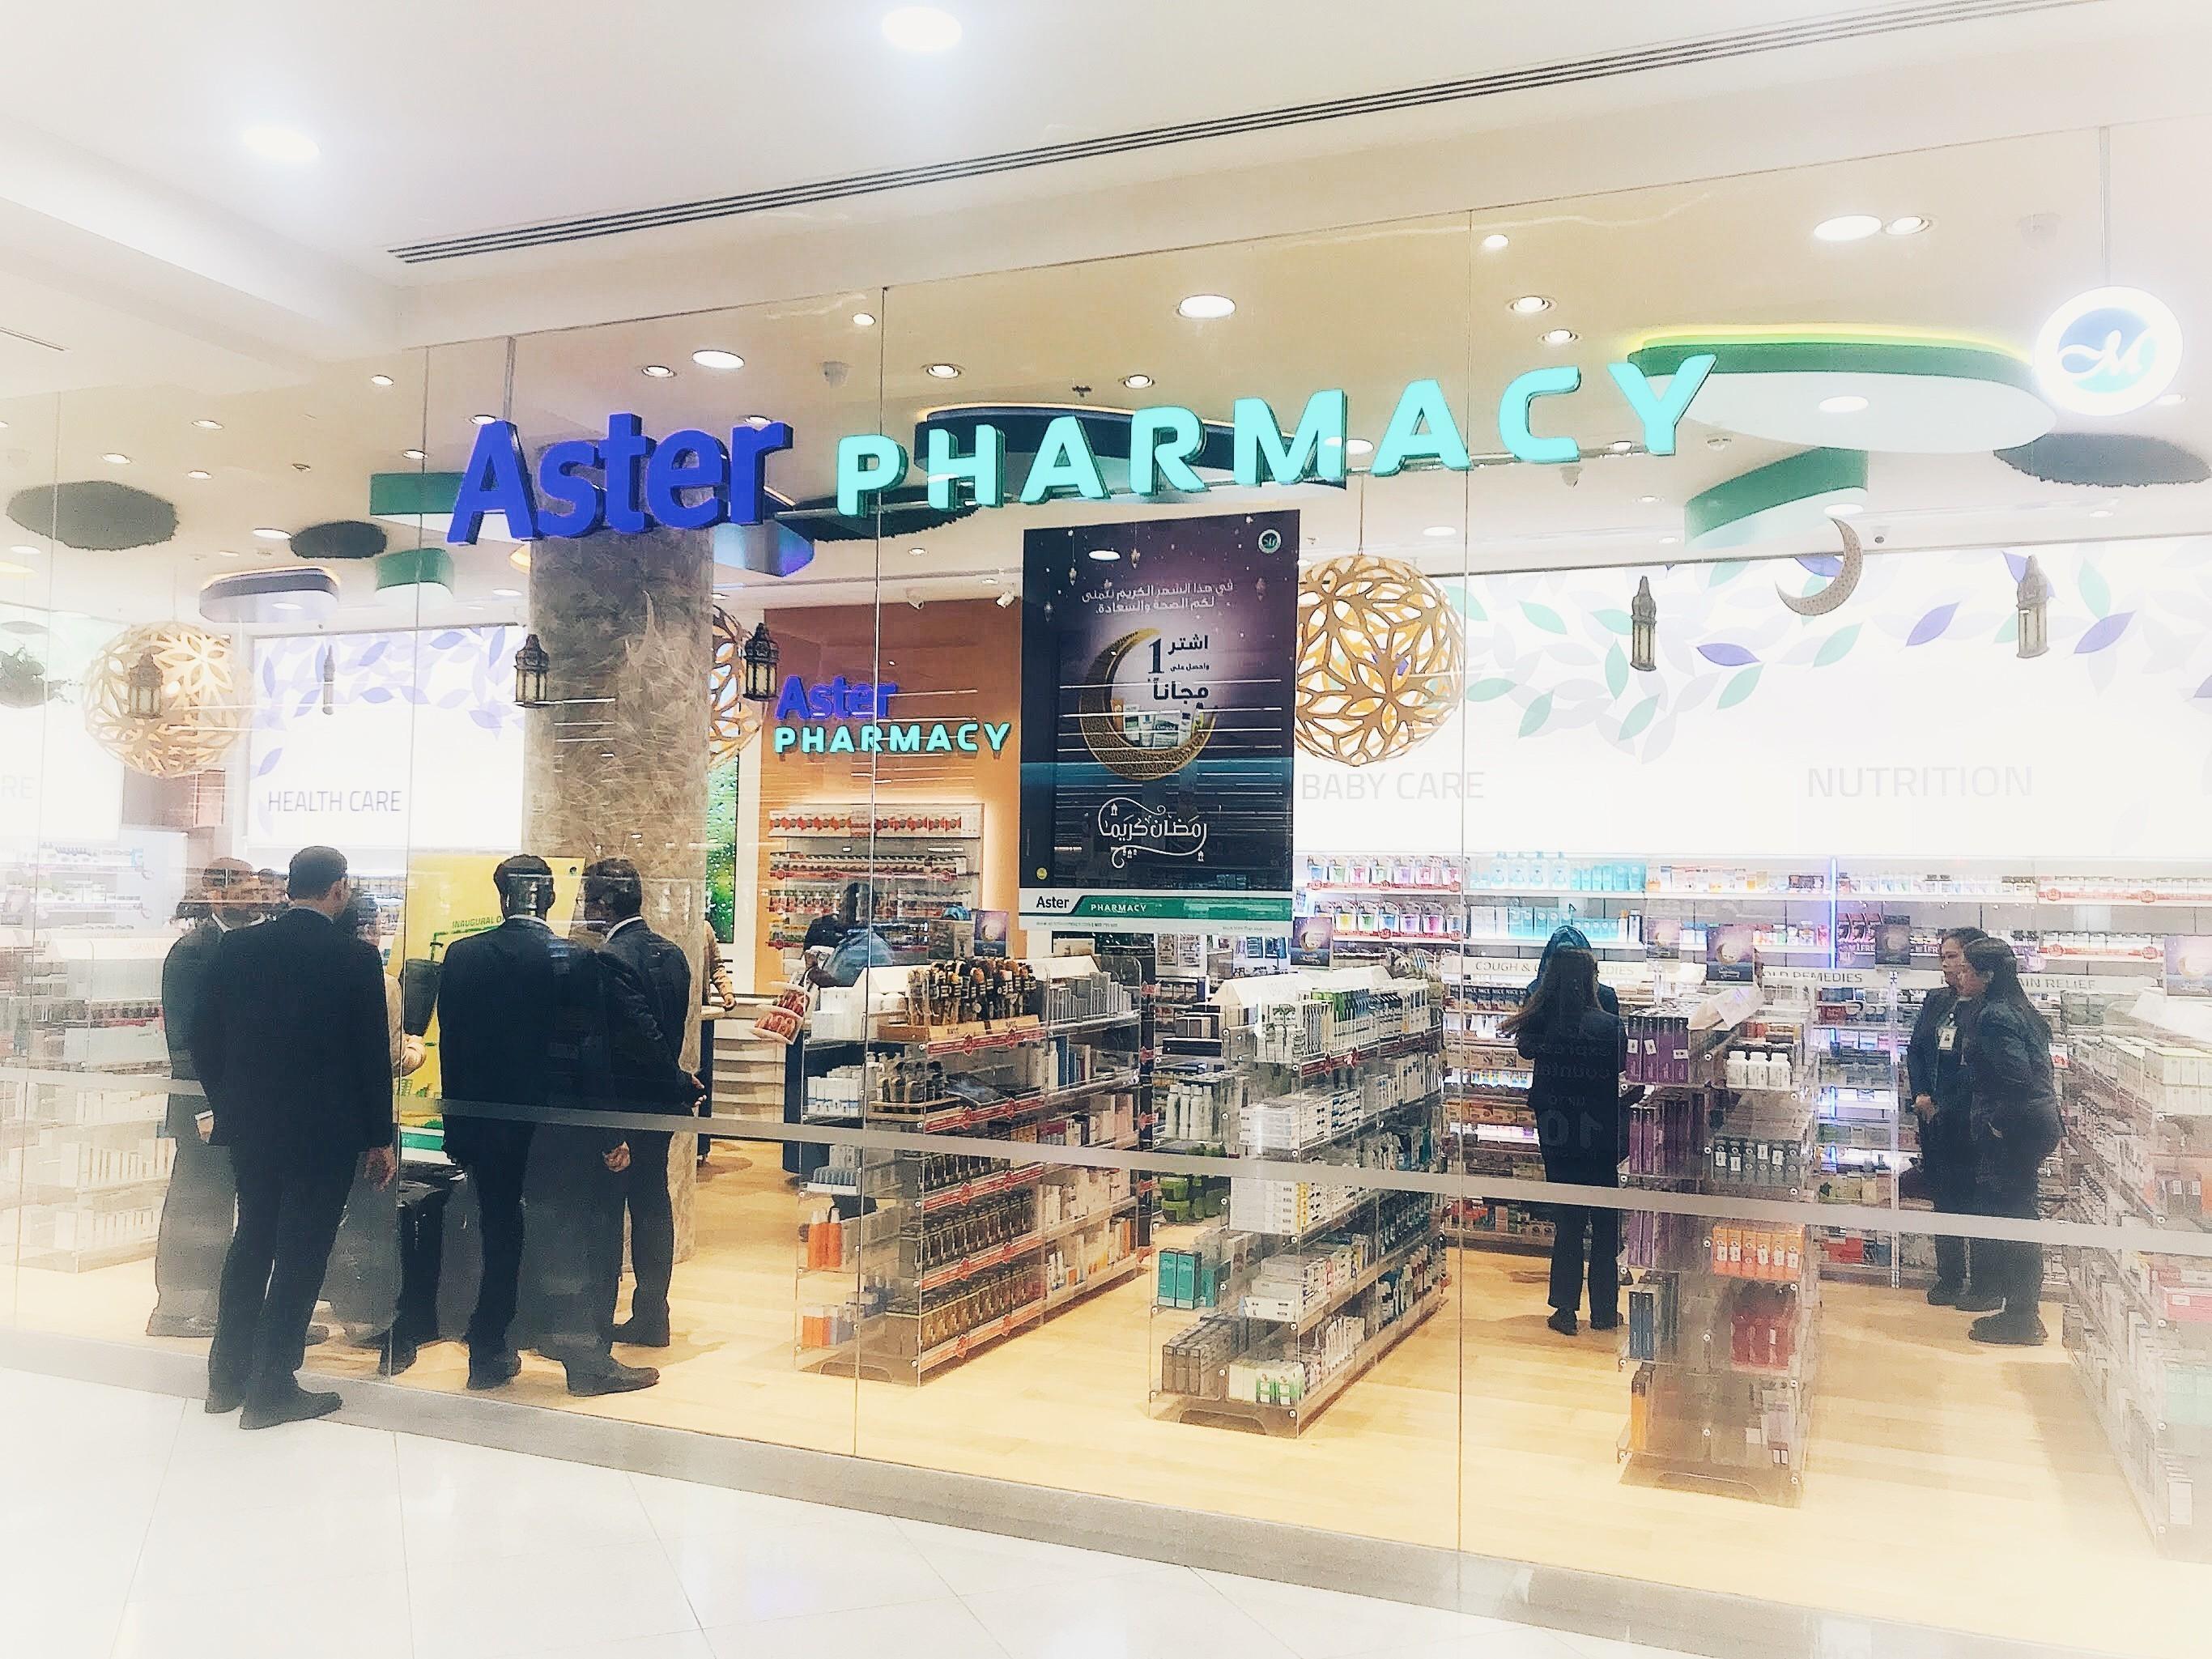 a NEW Pharmacy Chain